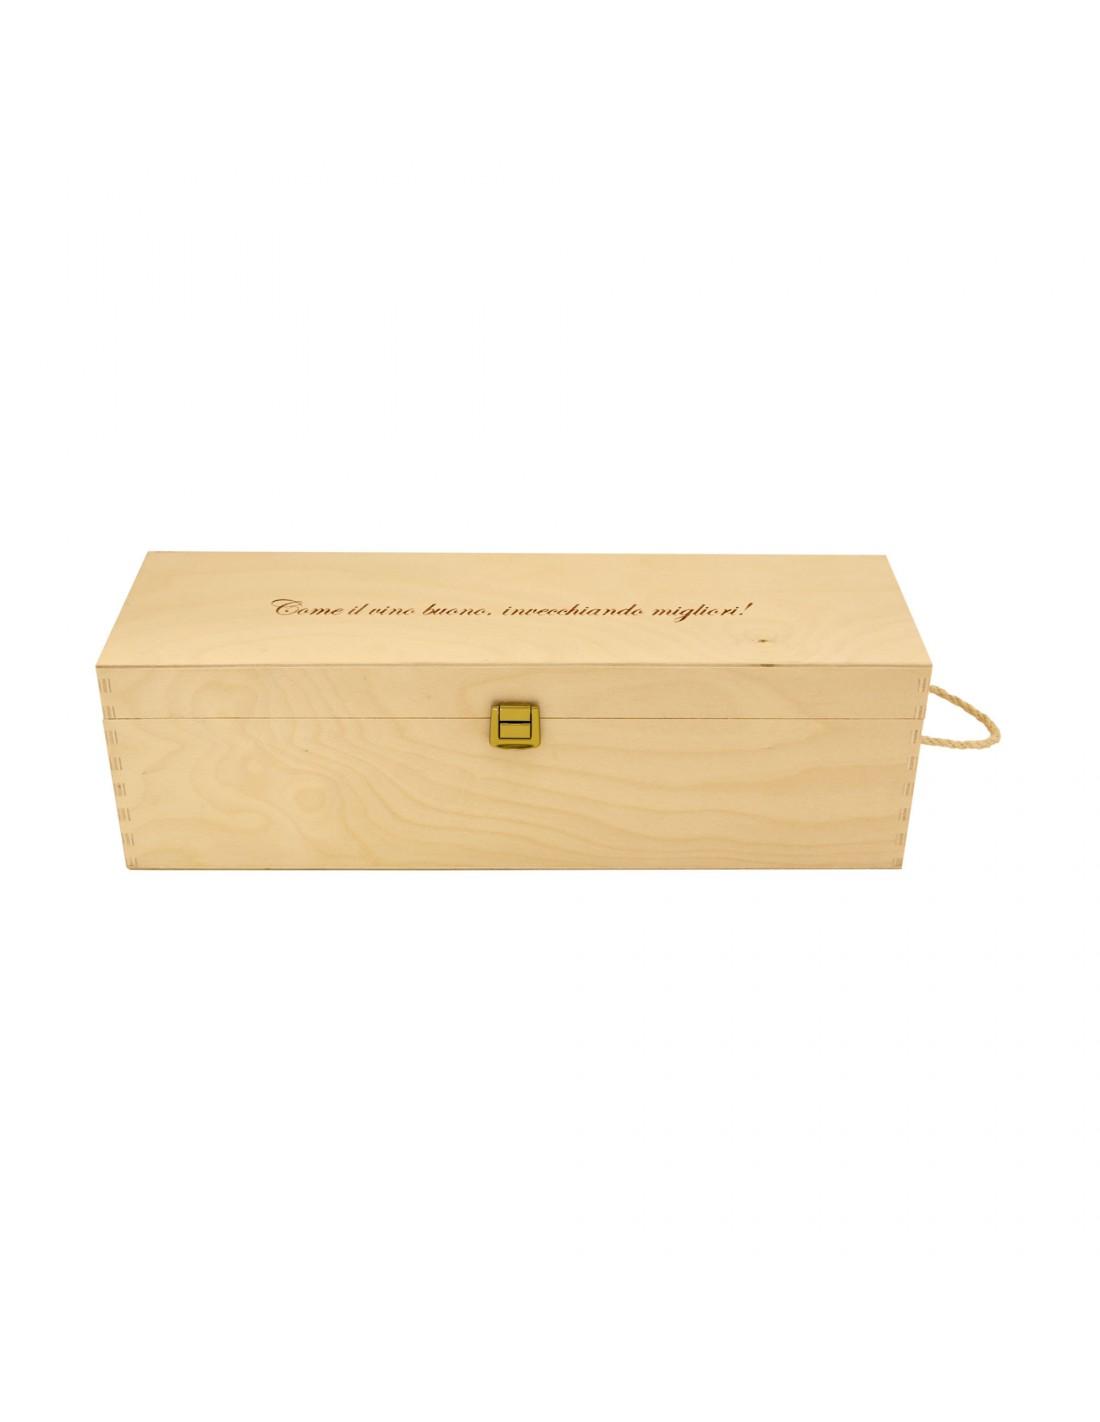 PERSONALIZED WOODEN WINE BOX - 1 MAGNUM BOTTLE - ILVA MAGNUM